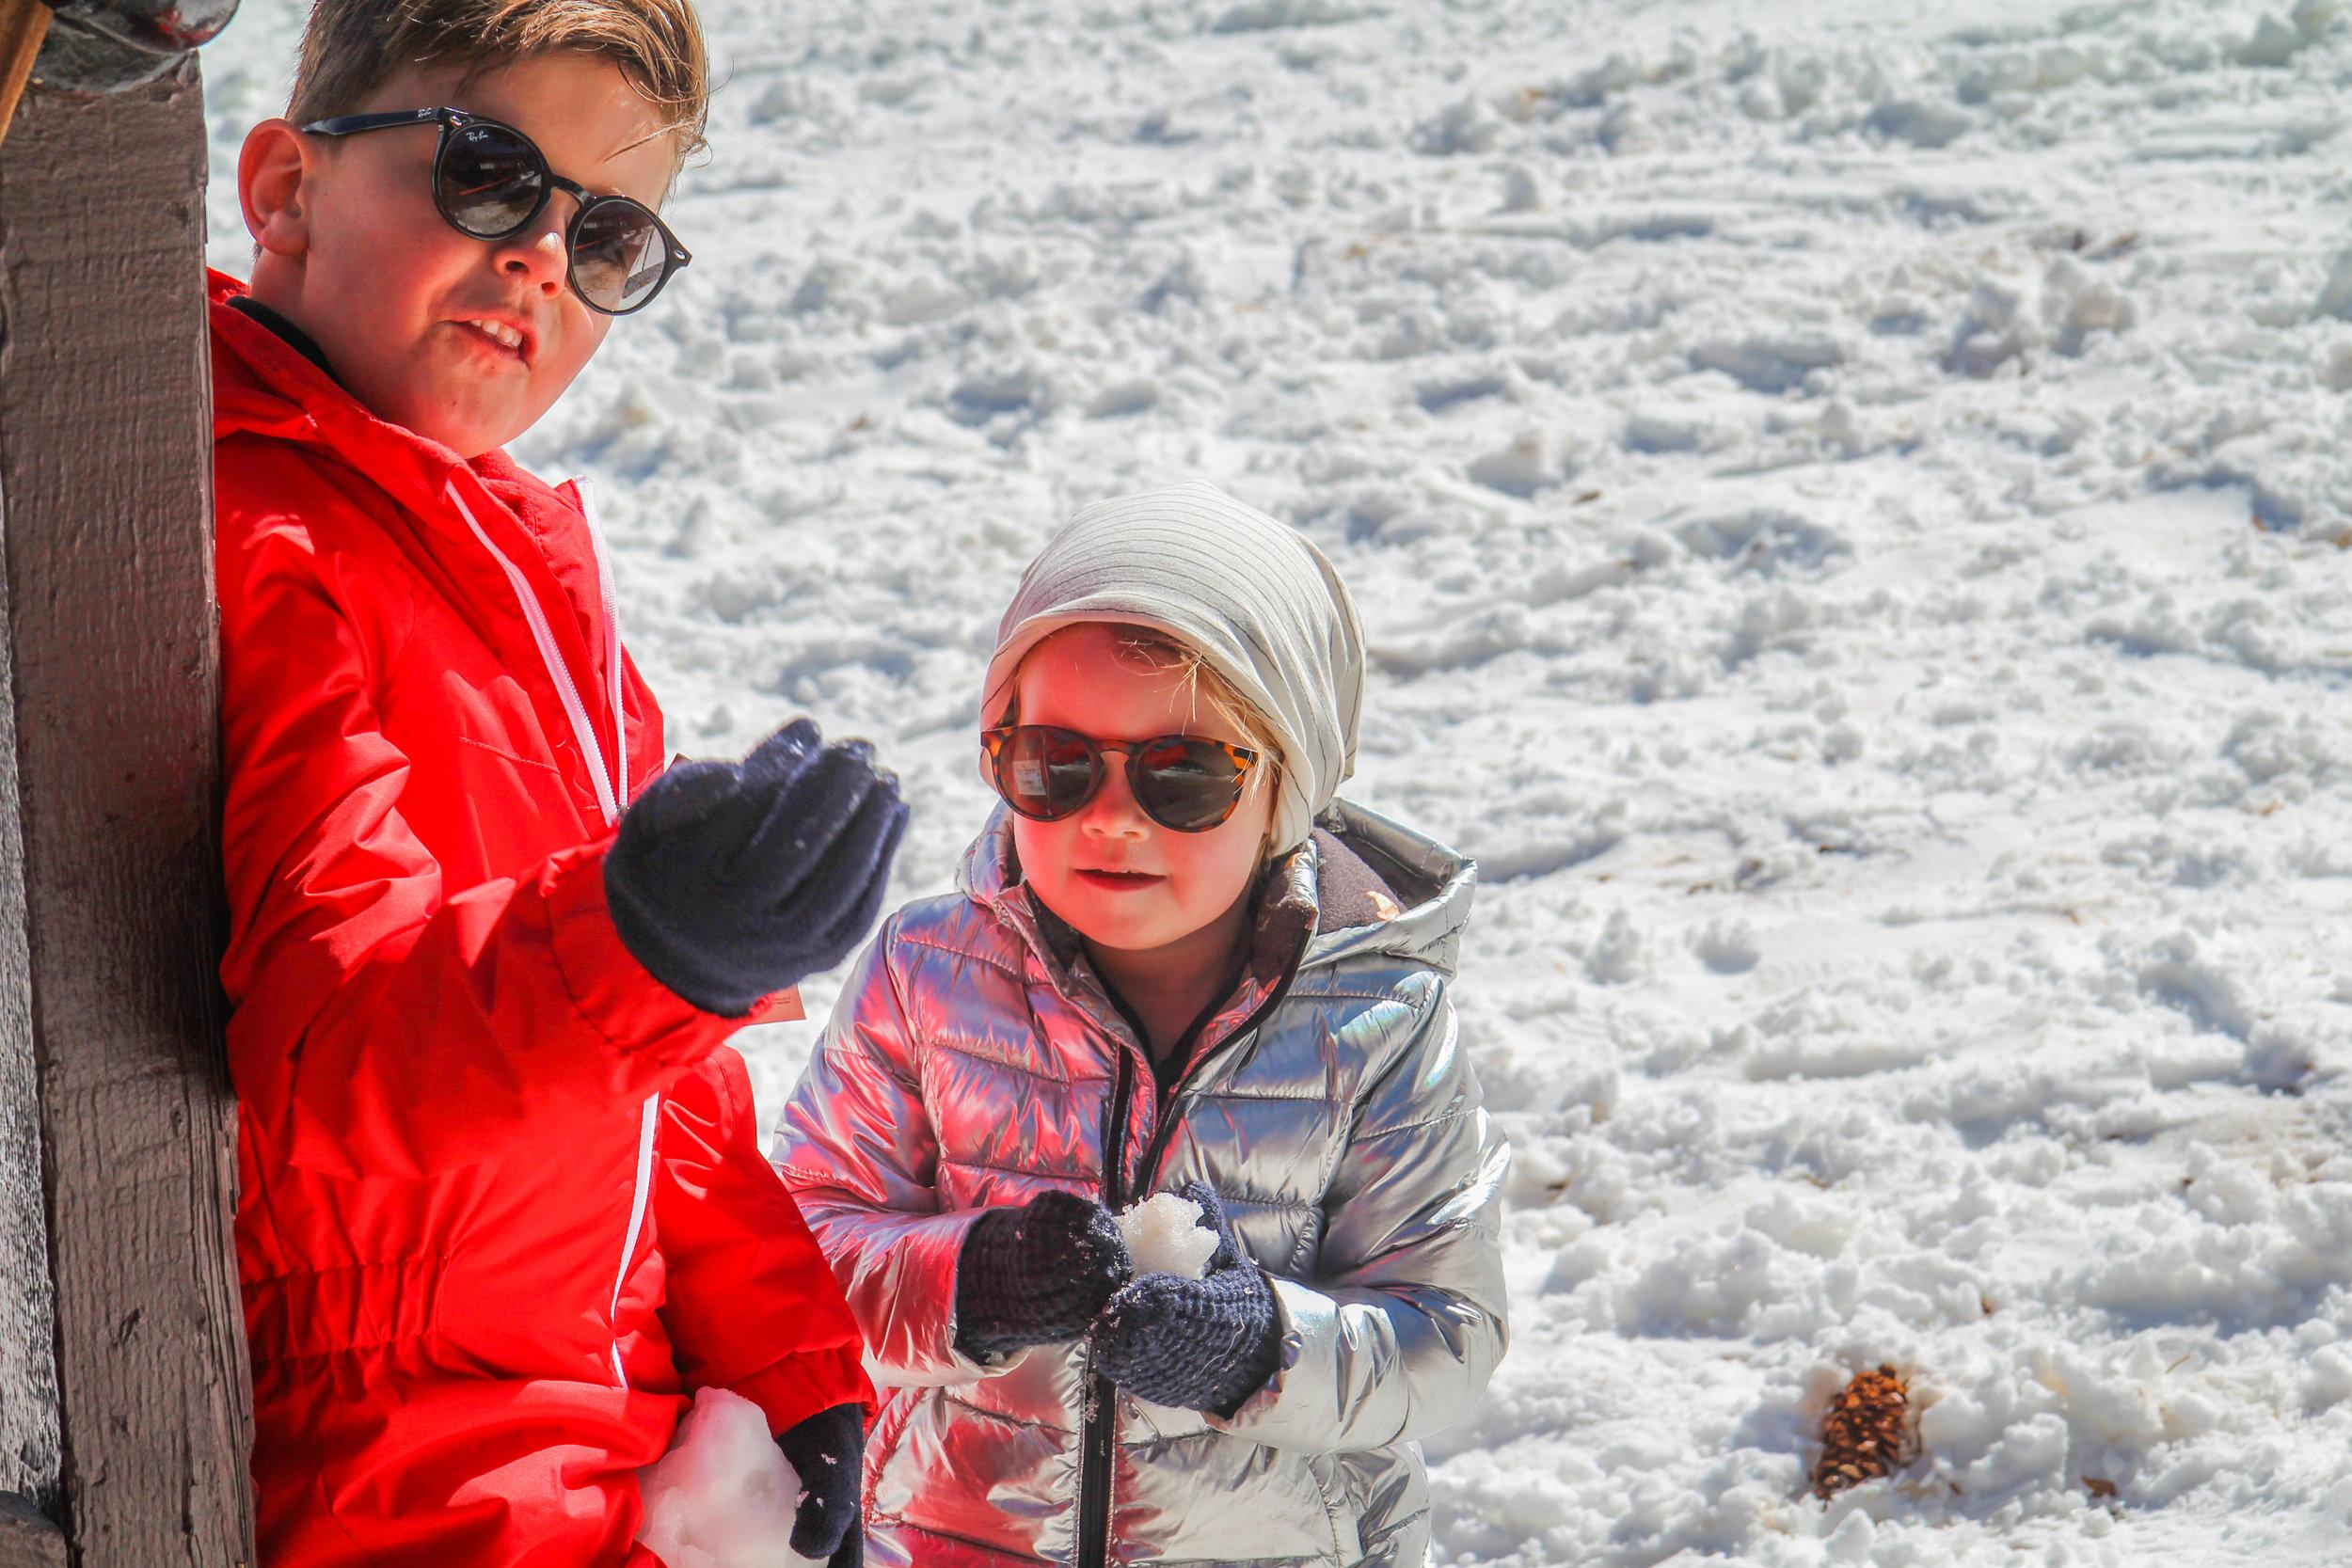 Big_bear_lake_snow_summit_Los angeles-3.JPG